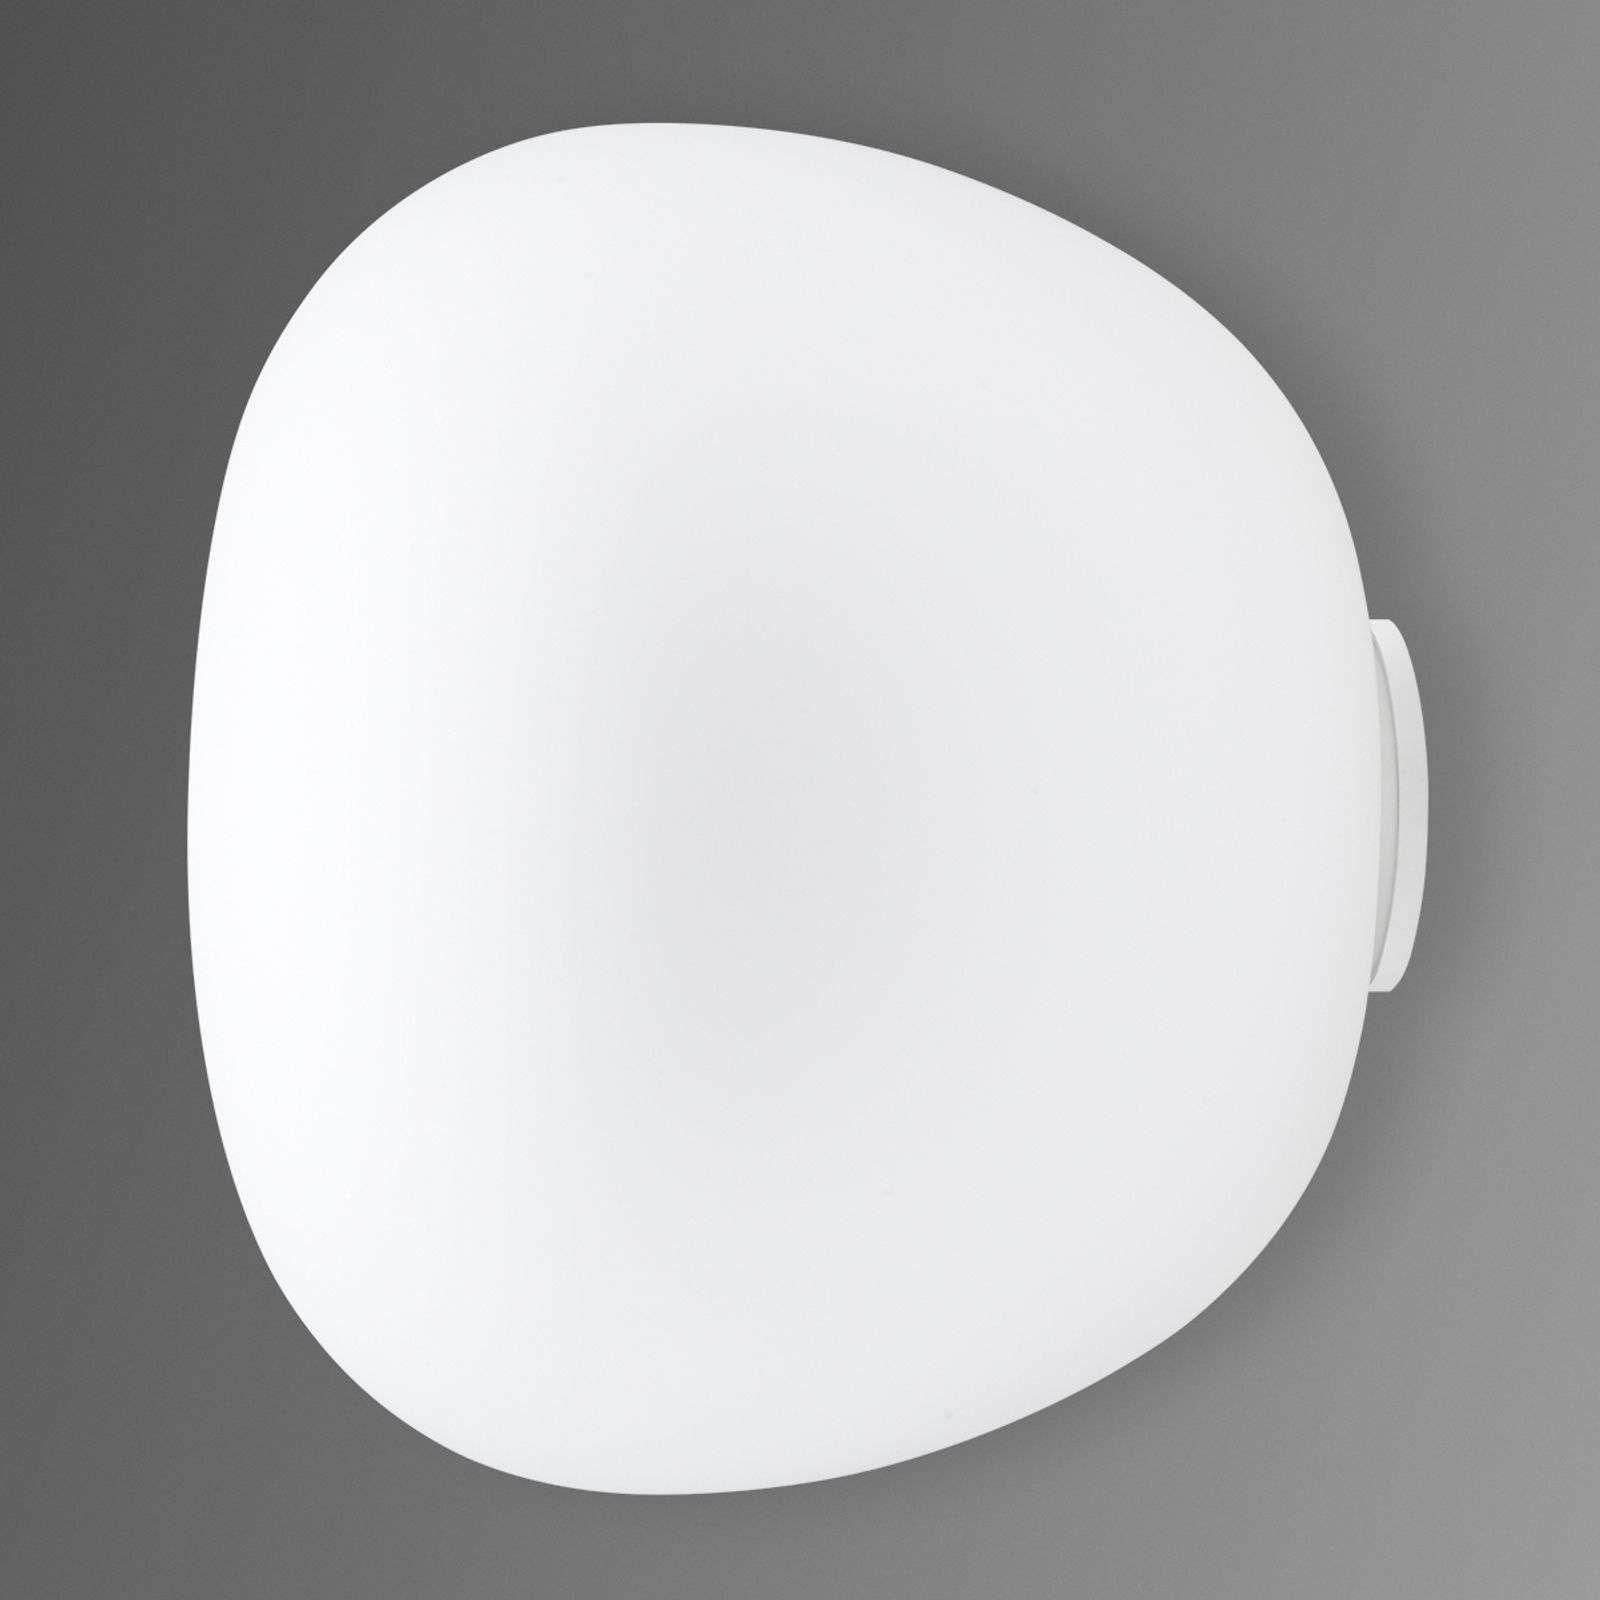 L Excellent Plafonnier Mochi In 2020 Plafondlamp Plafondverlichting Mondgeblazen Glas